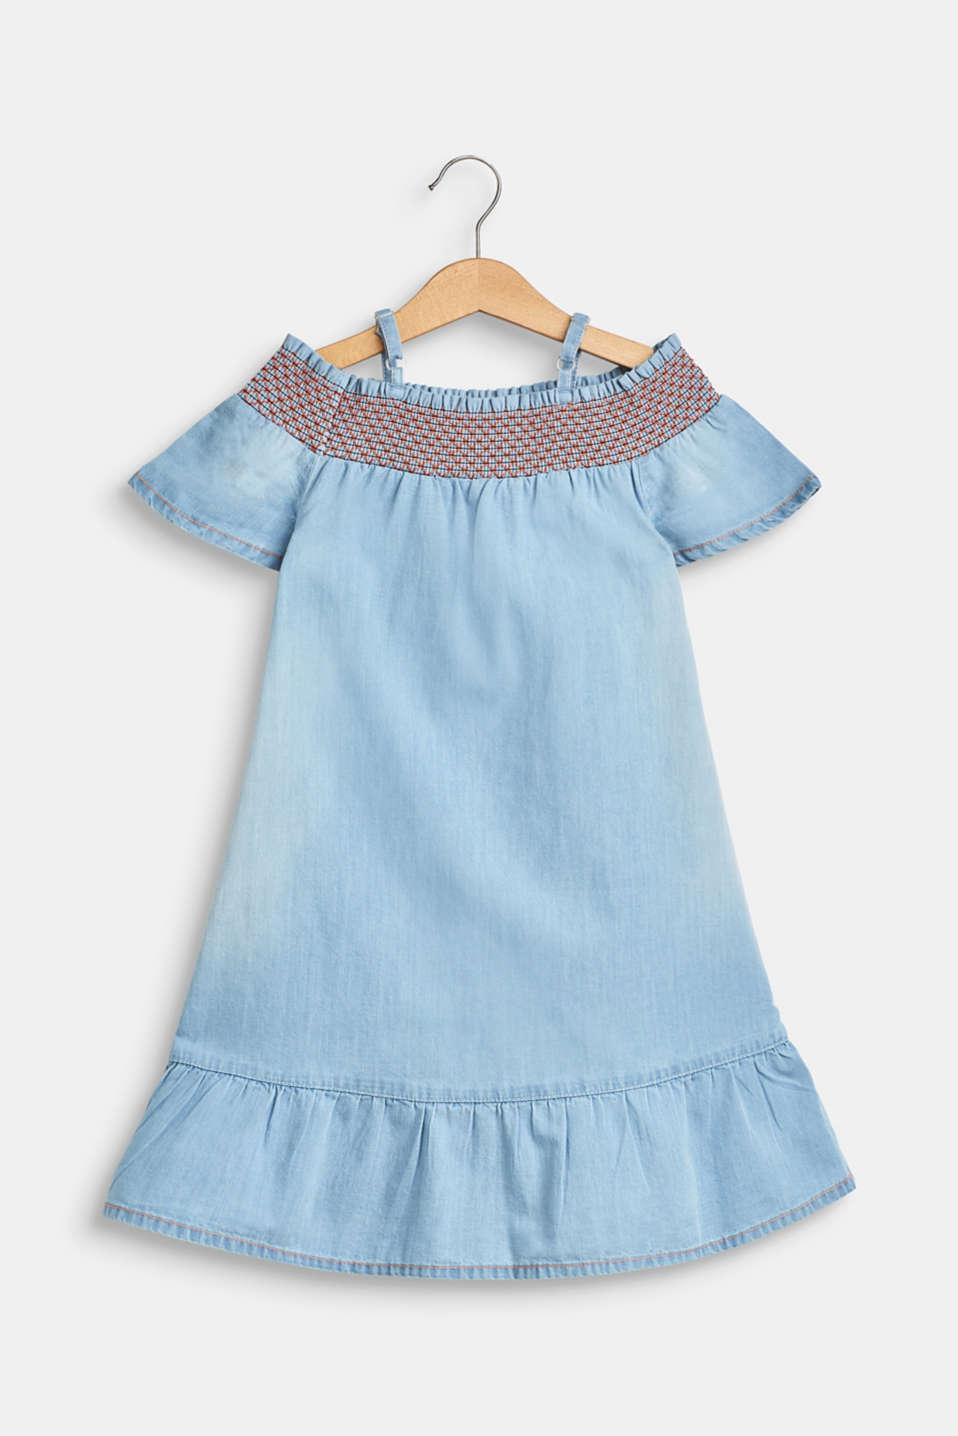 Off-the-shoulder dress in a denim look, 100% cotton, BLUE LIGHT WAS, detail image number 1